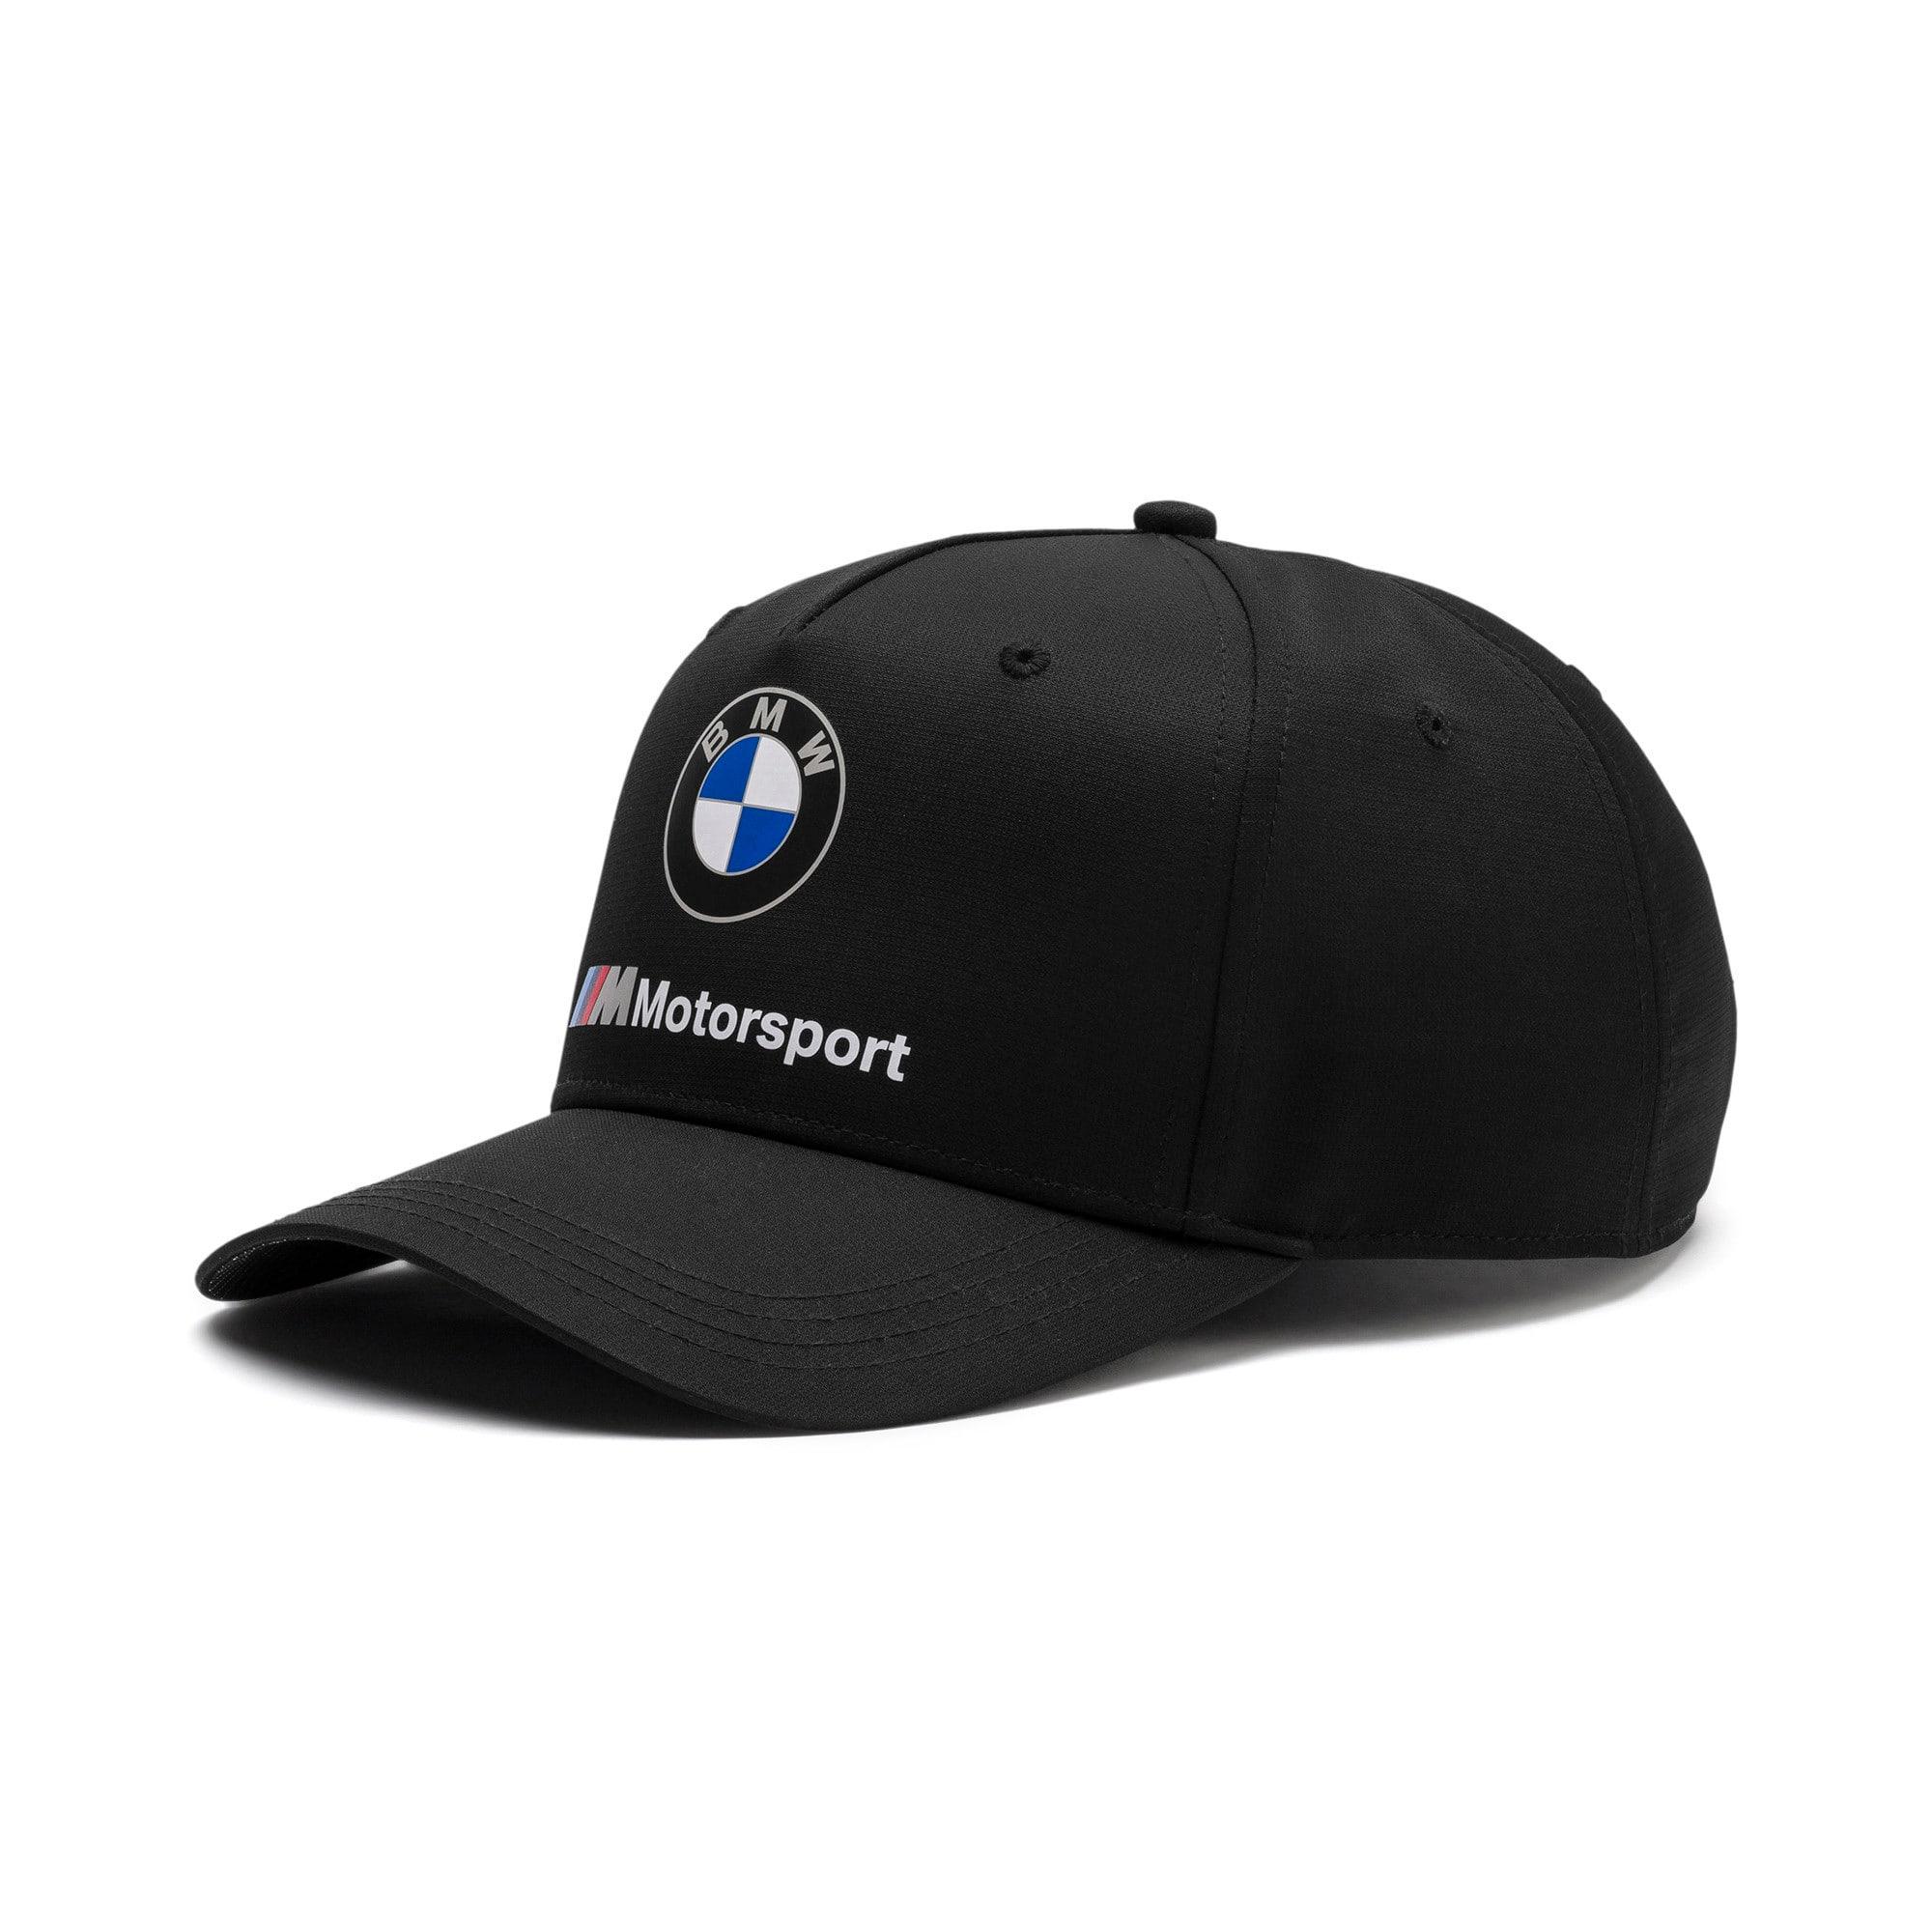 Thumbnail 1 of BMW M Motorsport Cap, Puma Black, medium